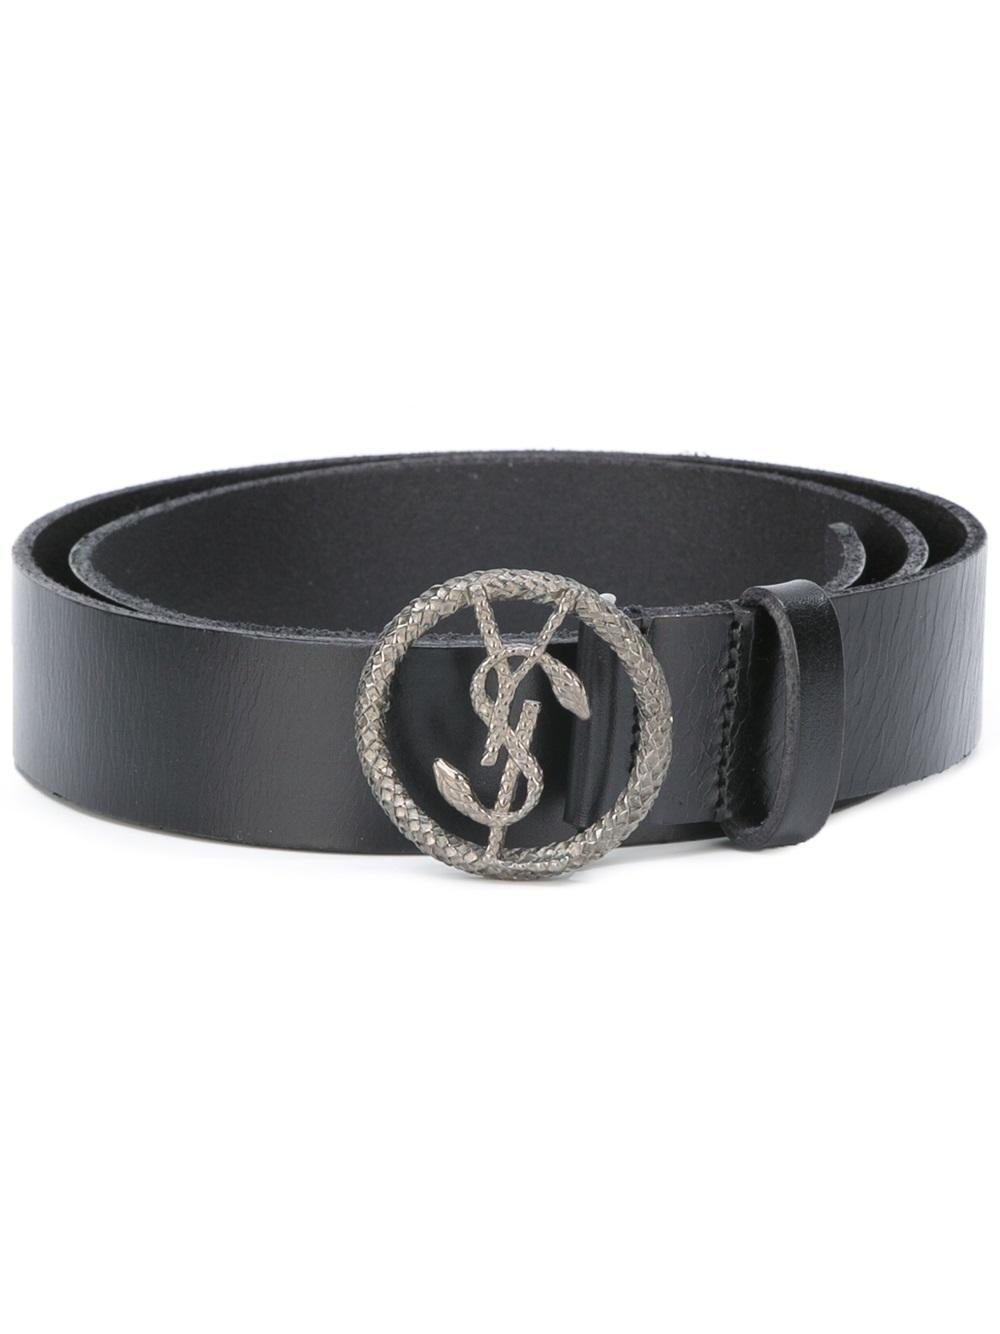 Lyst Saint Laurent Monogram Serpent Buckle Belt In Black